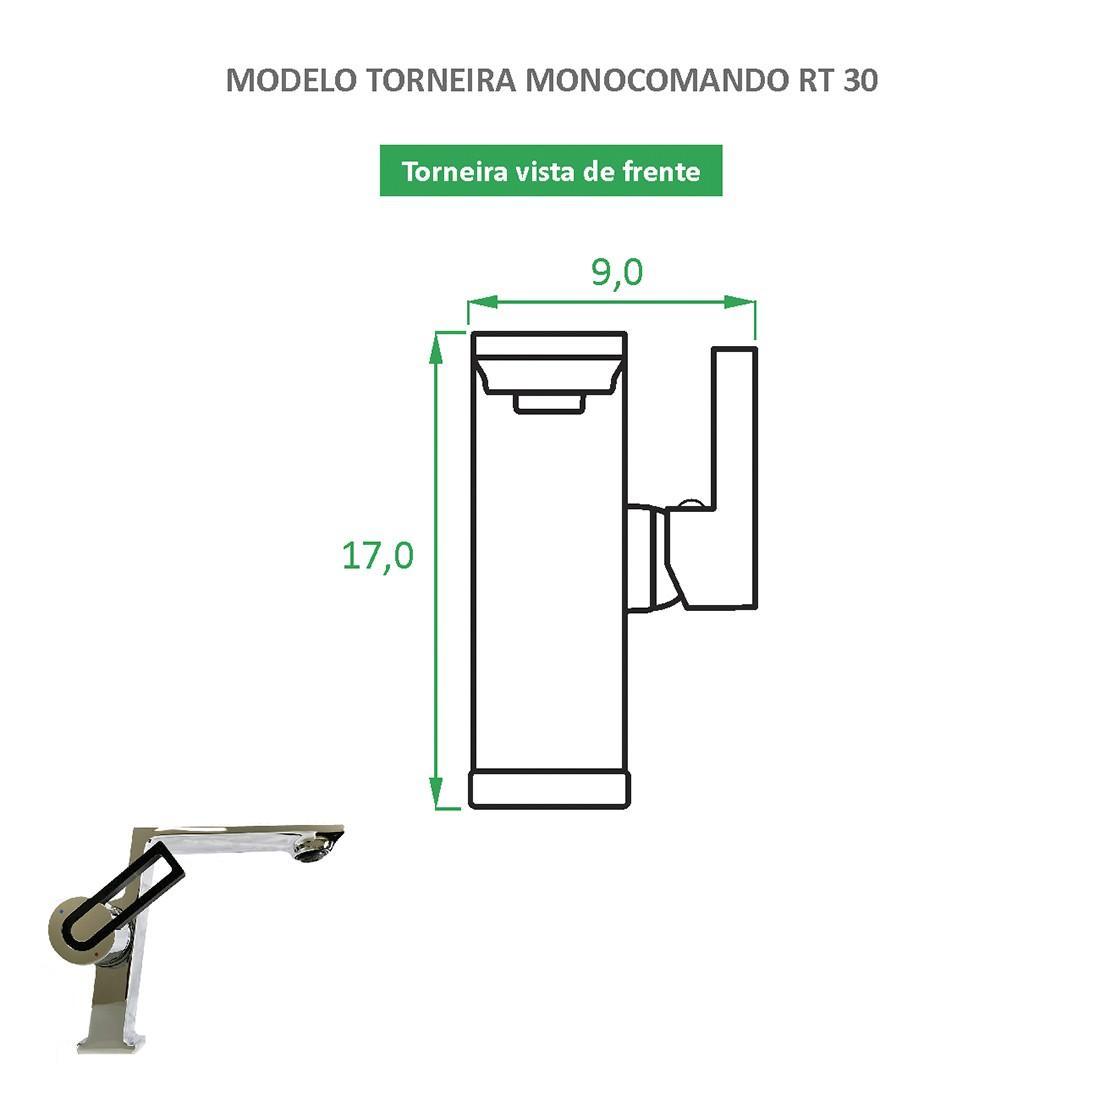 Torneira Monocomando Quadrada RT 30